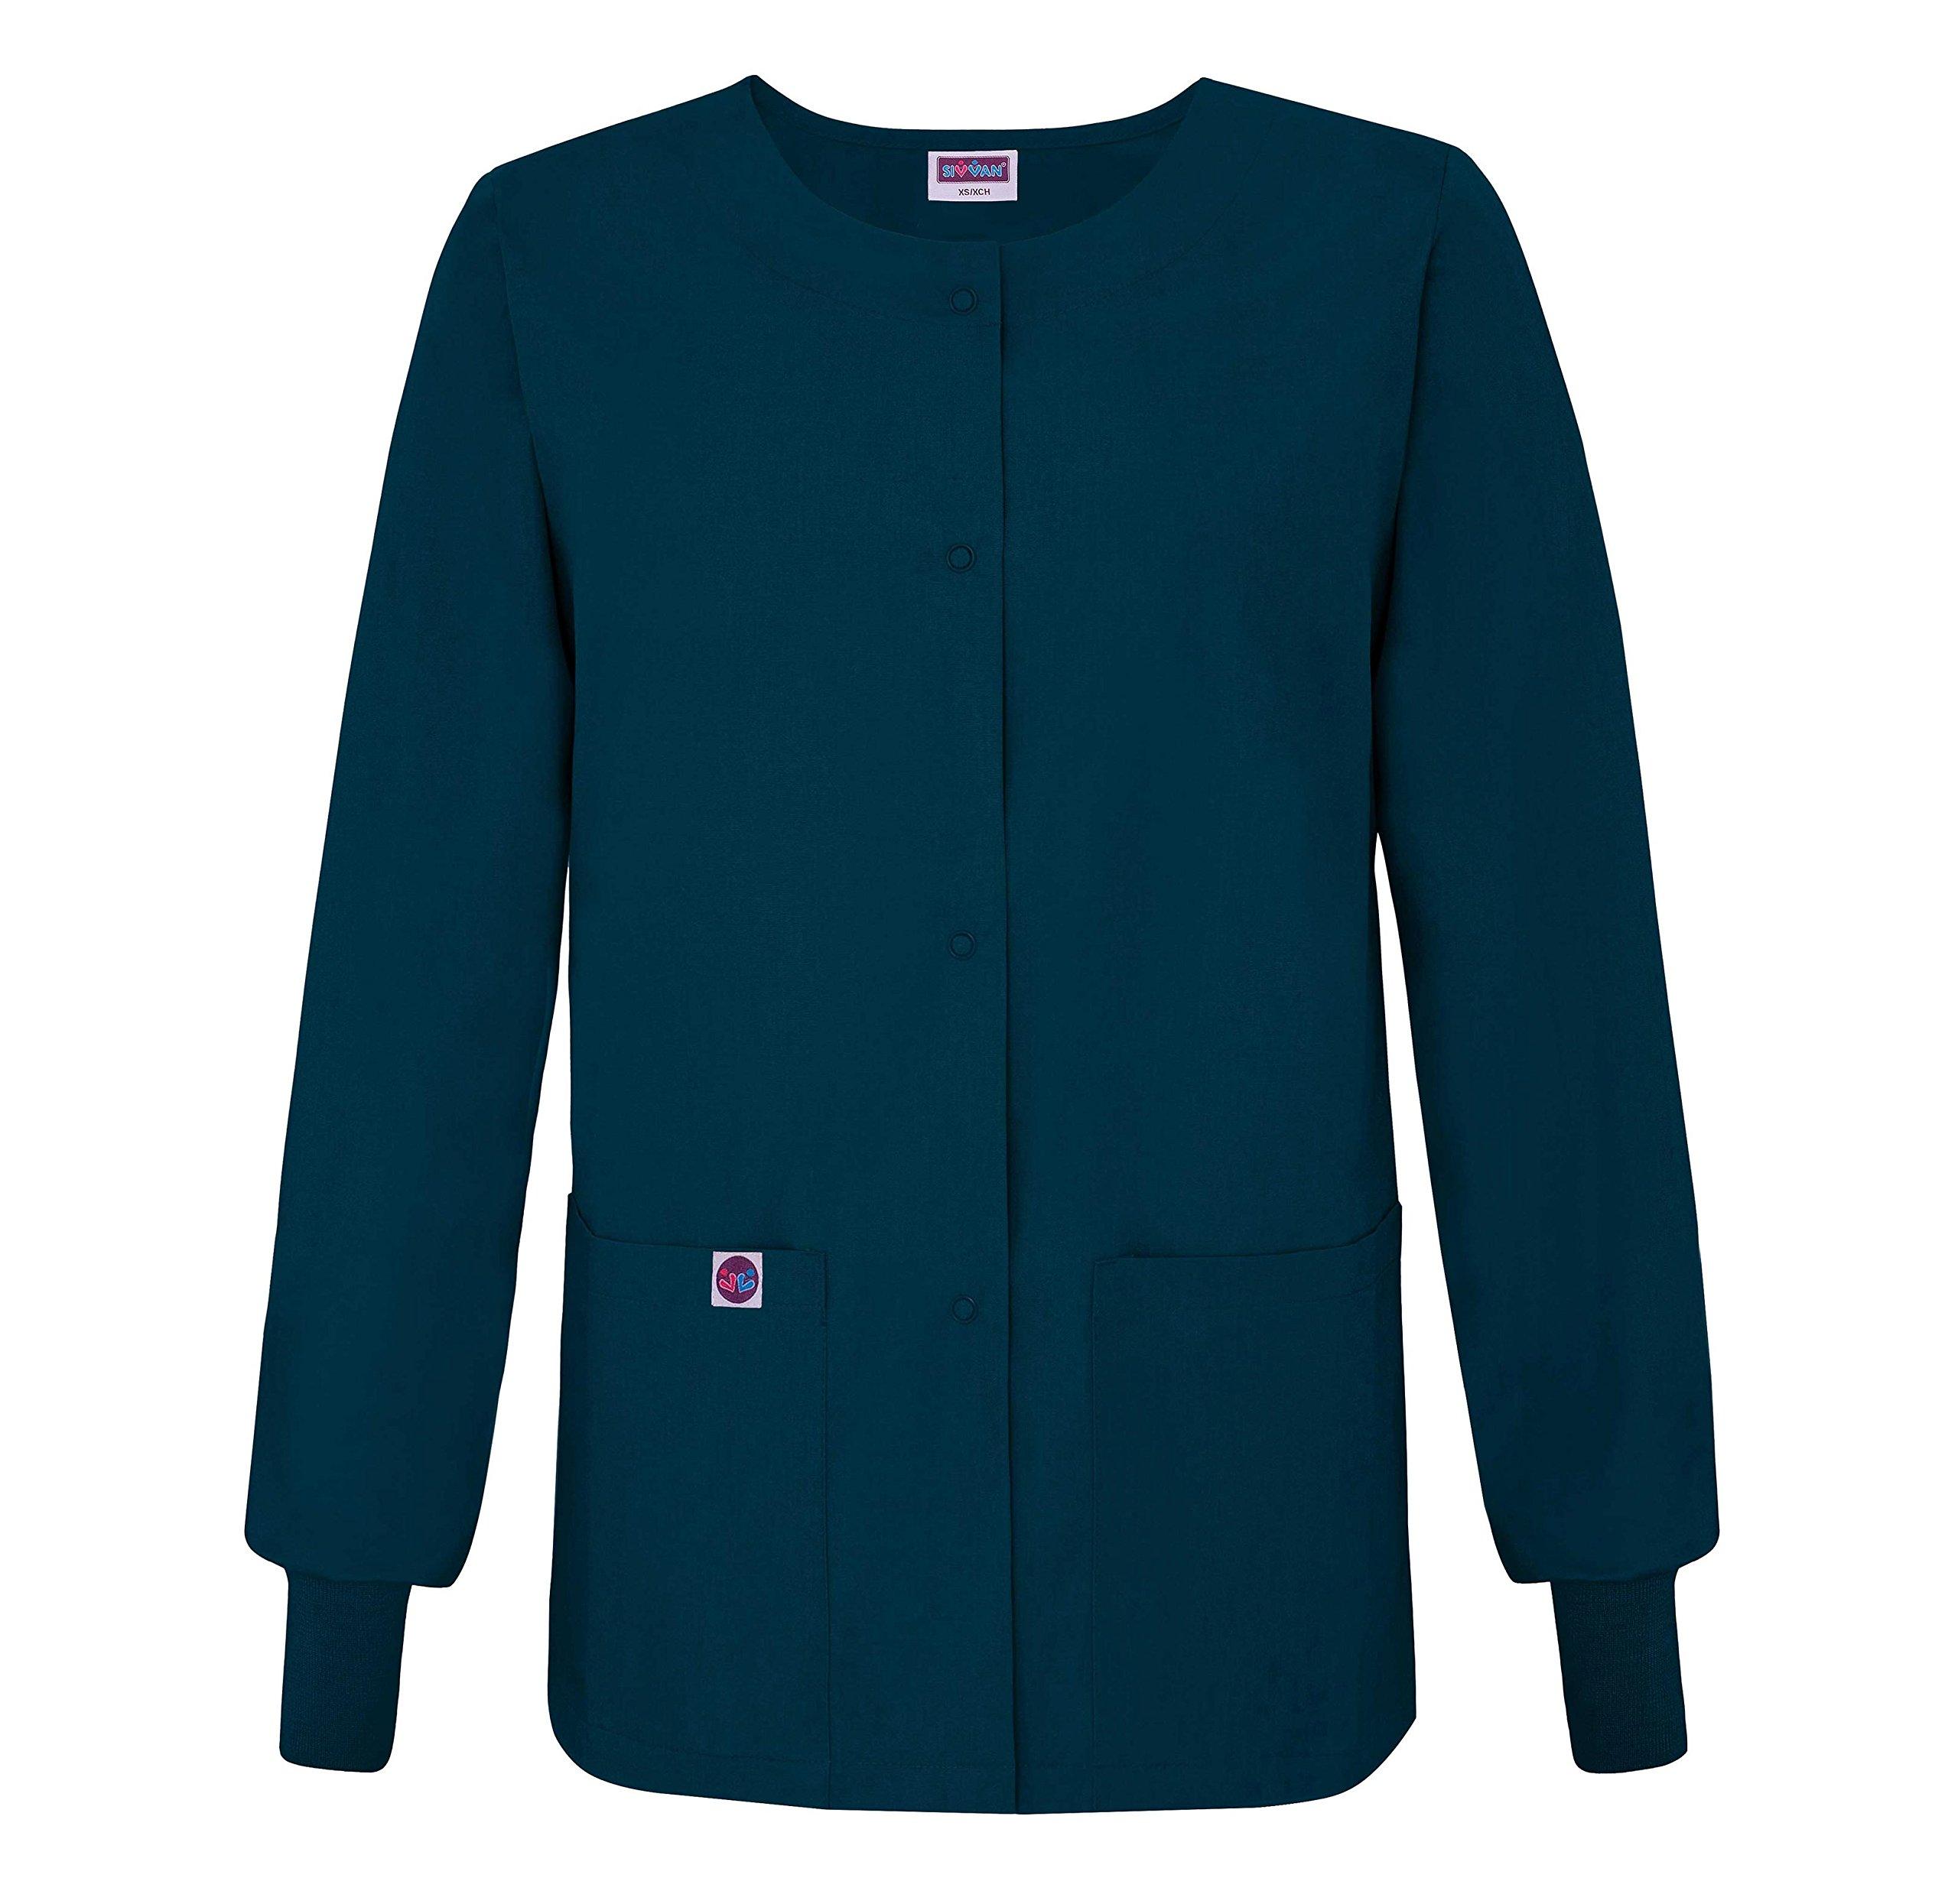 Sivvan Women's Scrub Warm-Up Jacket/Front Snaps - Round Neck - S8306 - Caribbean Blue - XL